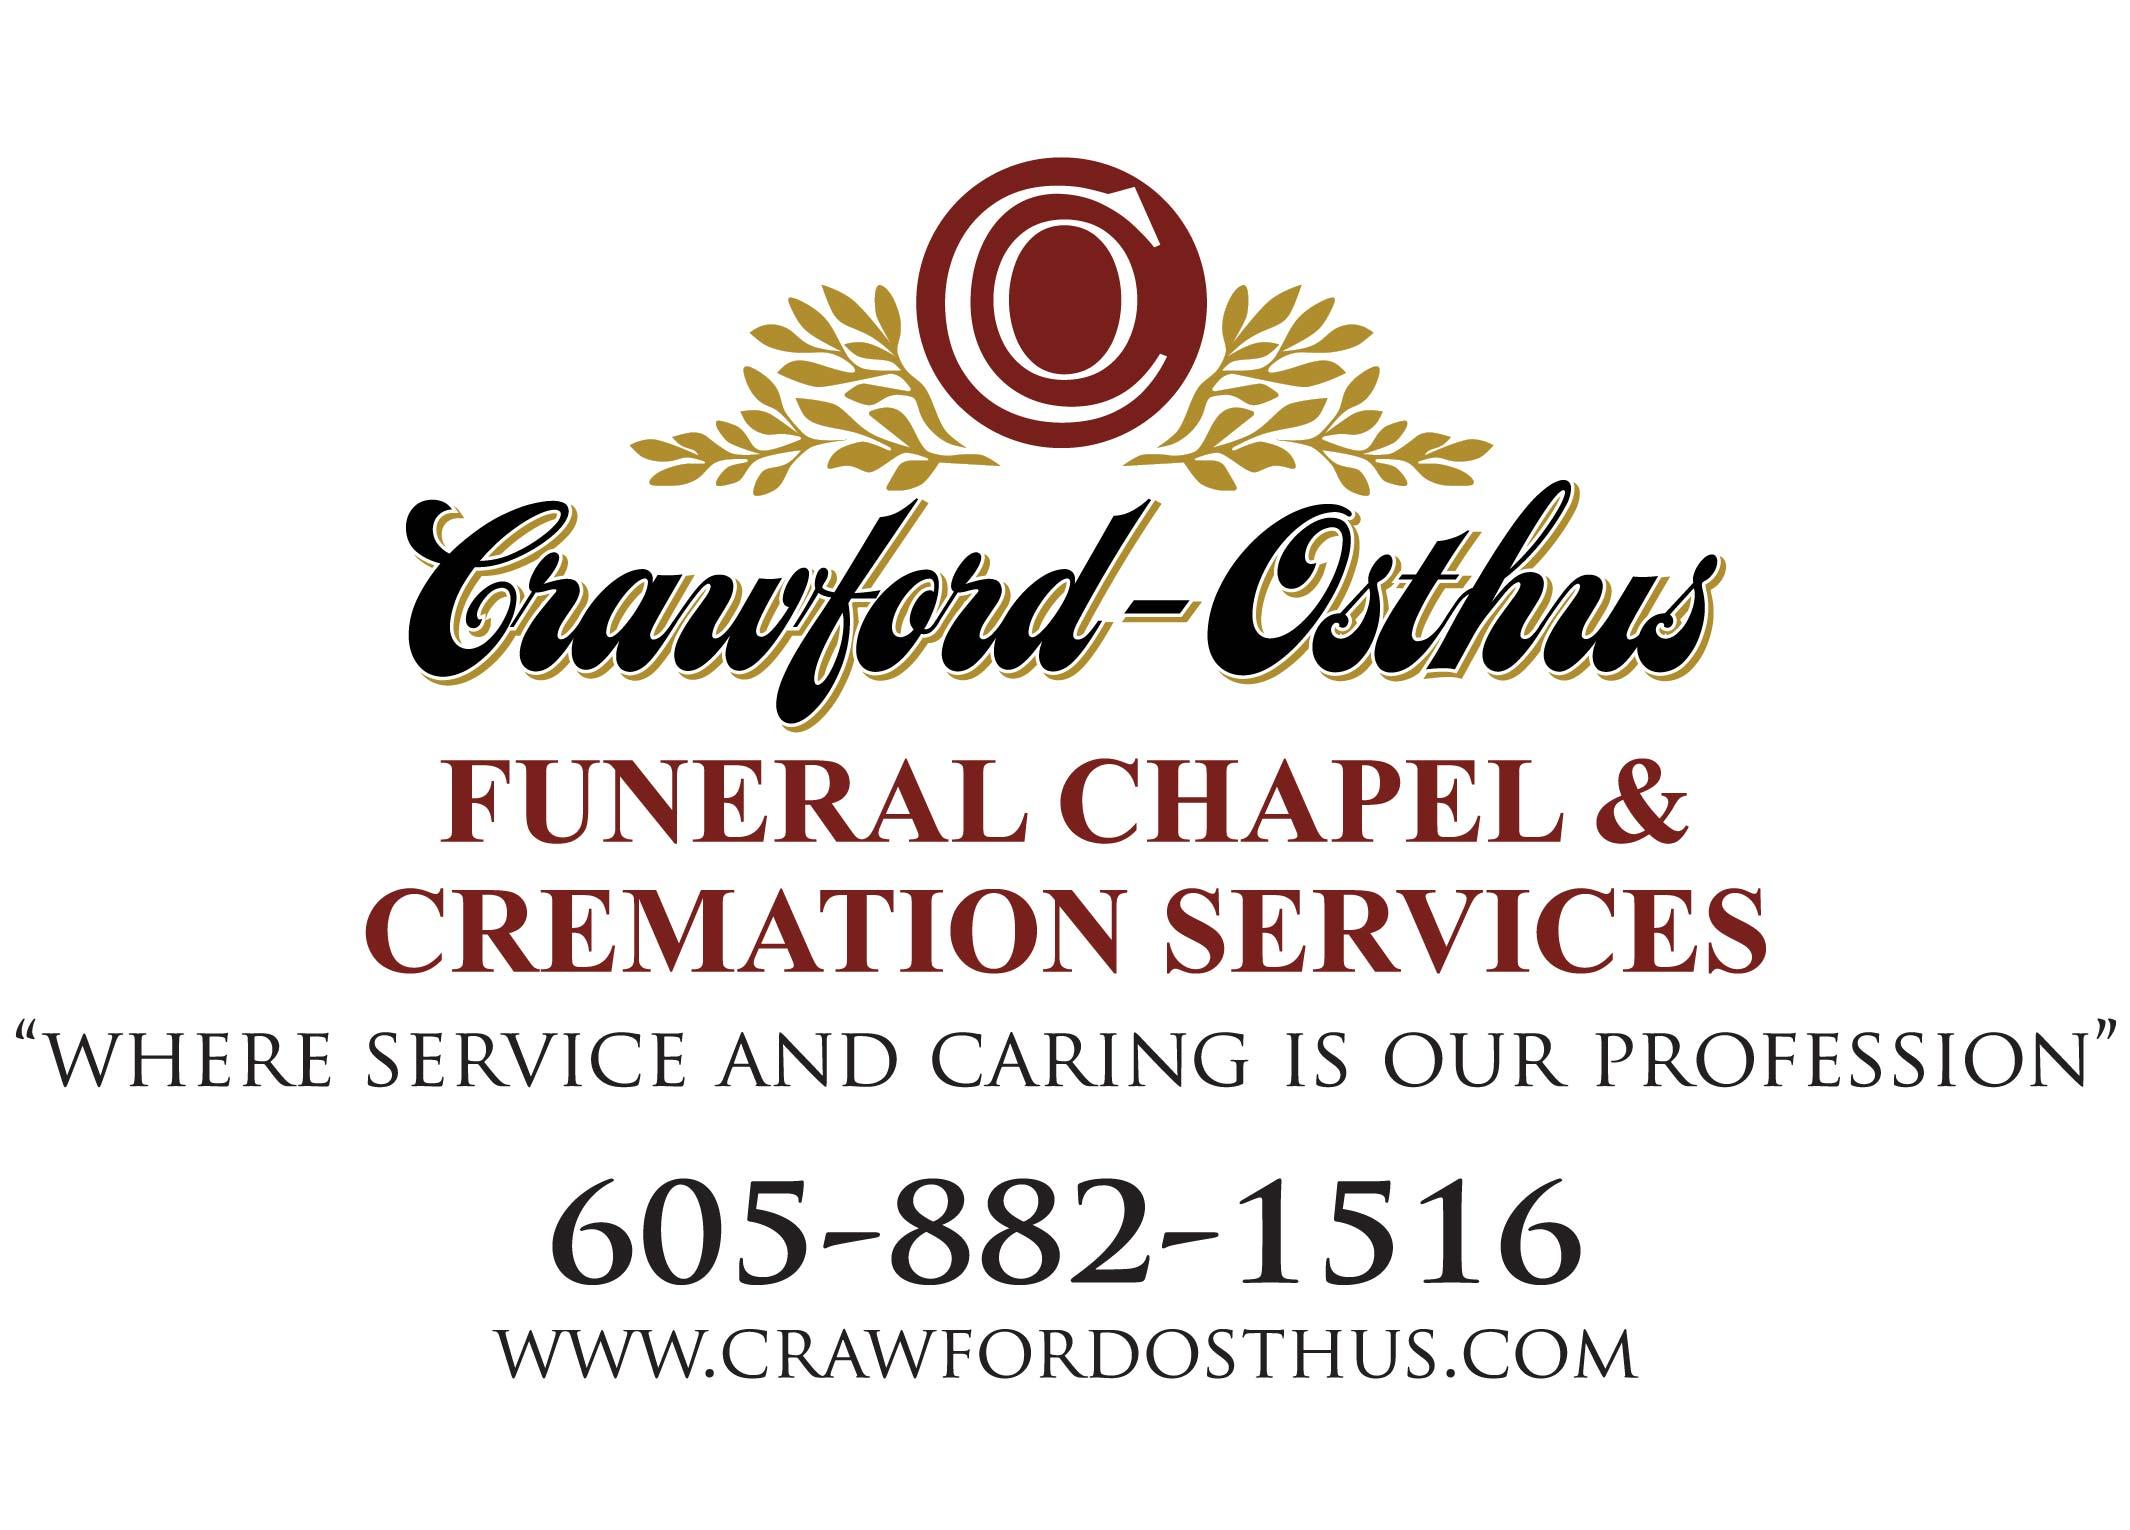 Crawford Osthus